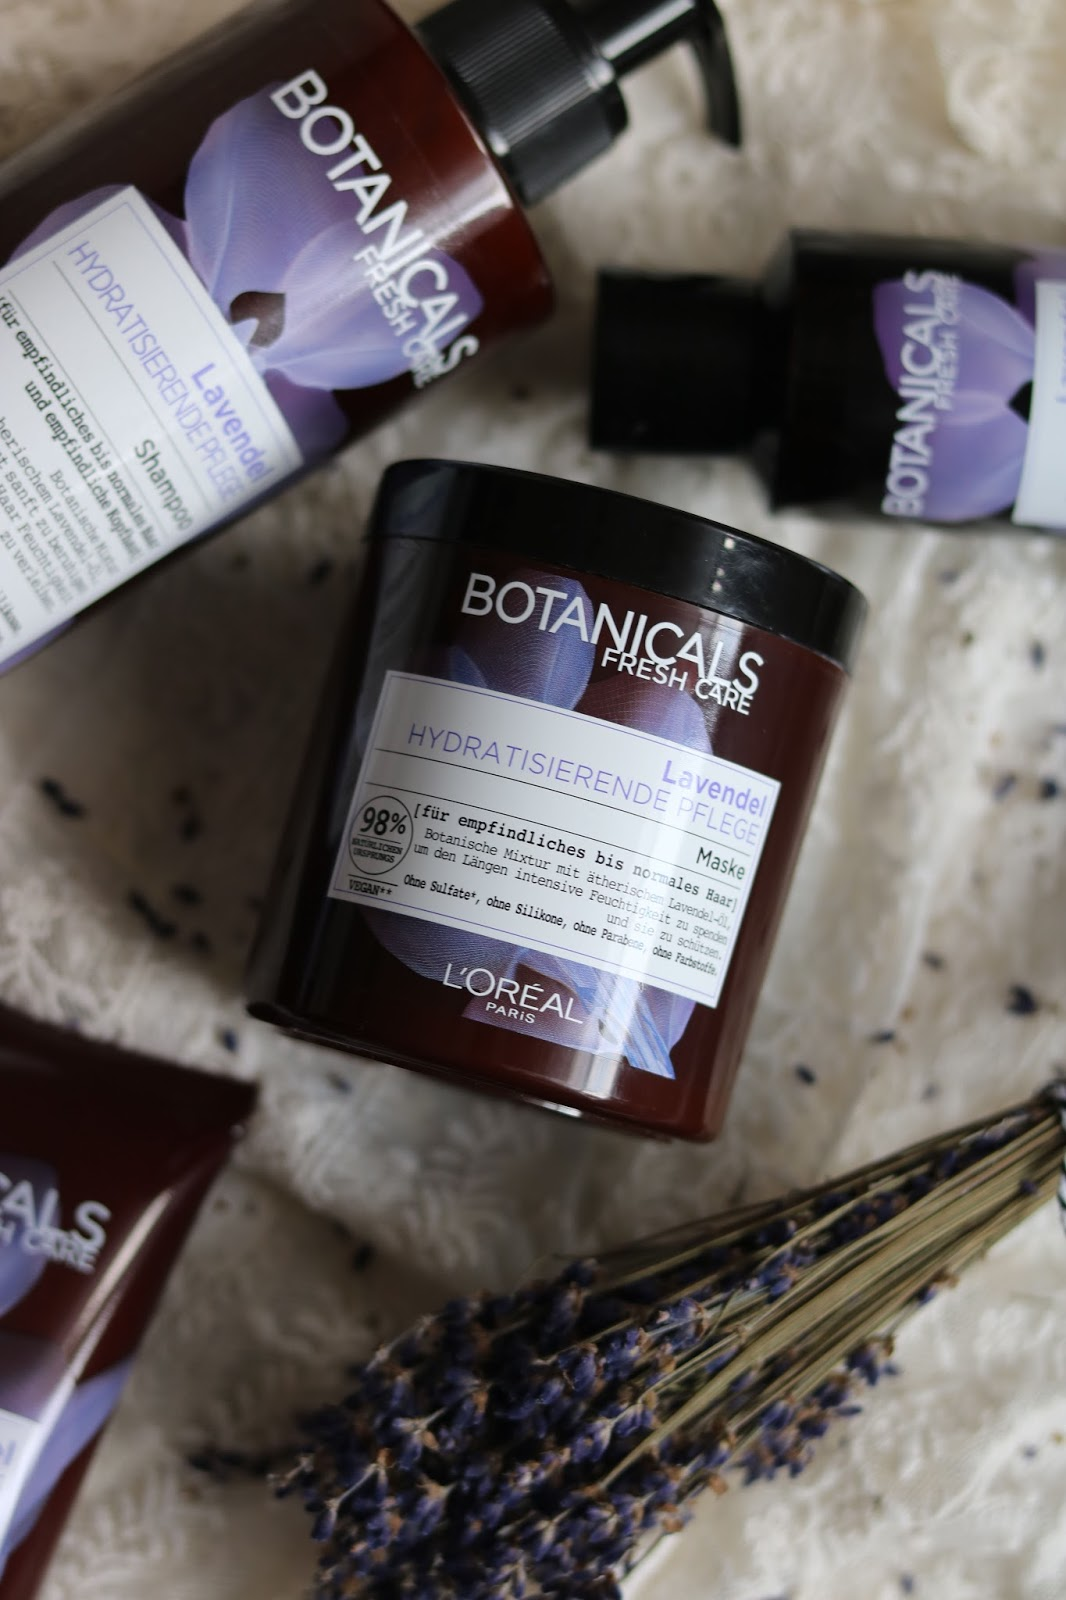 l orà al paris botanicals fresh care hydratisierende pflege